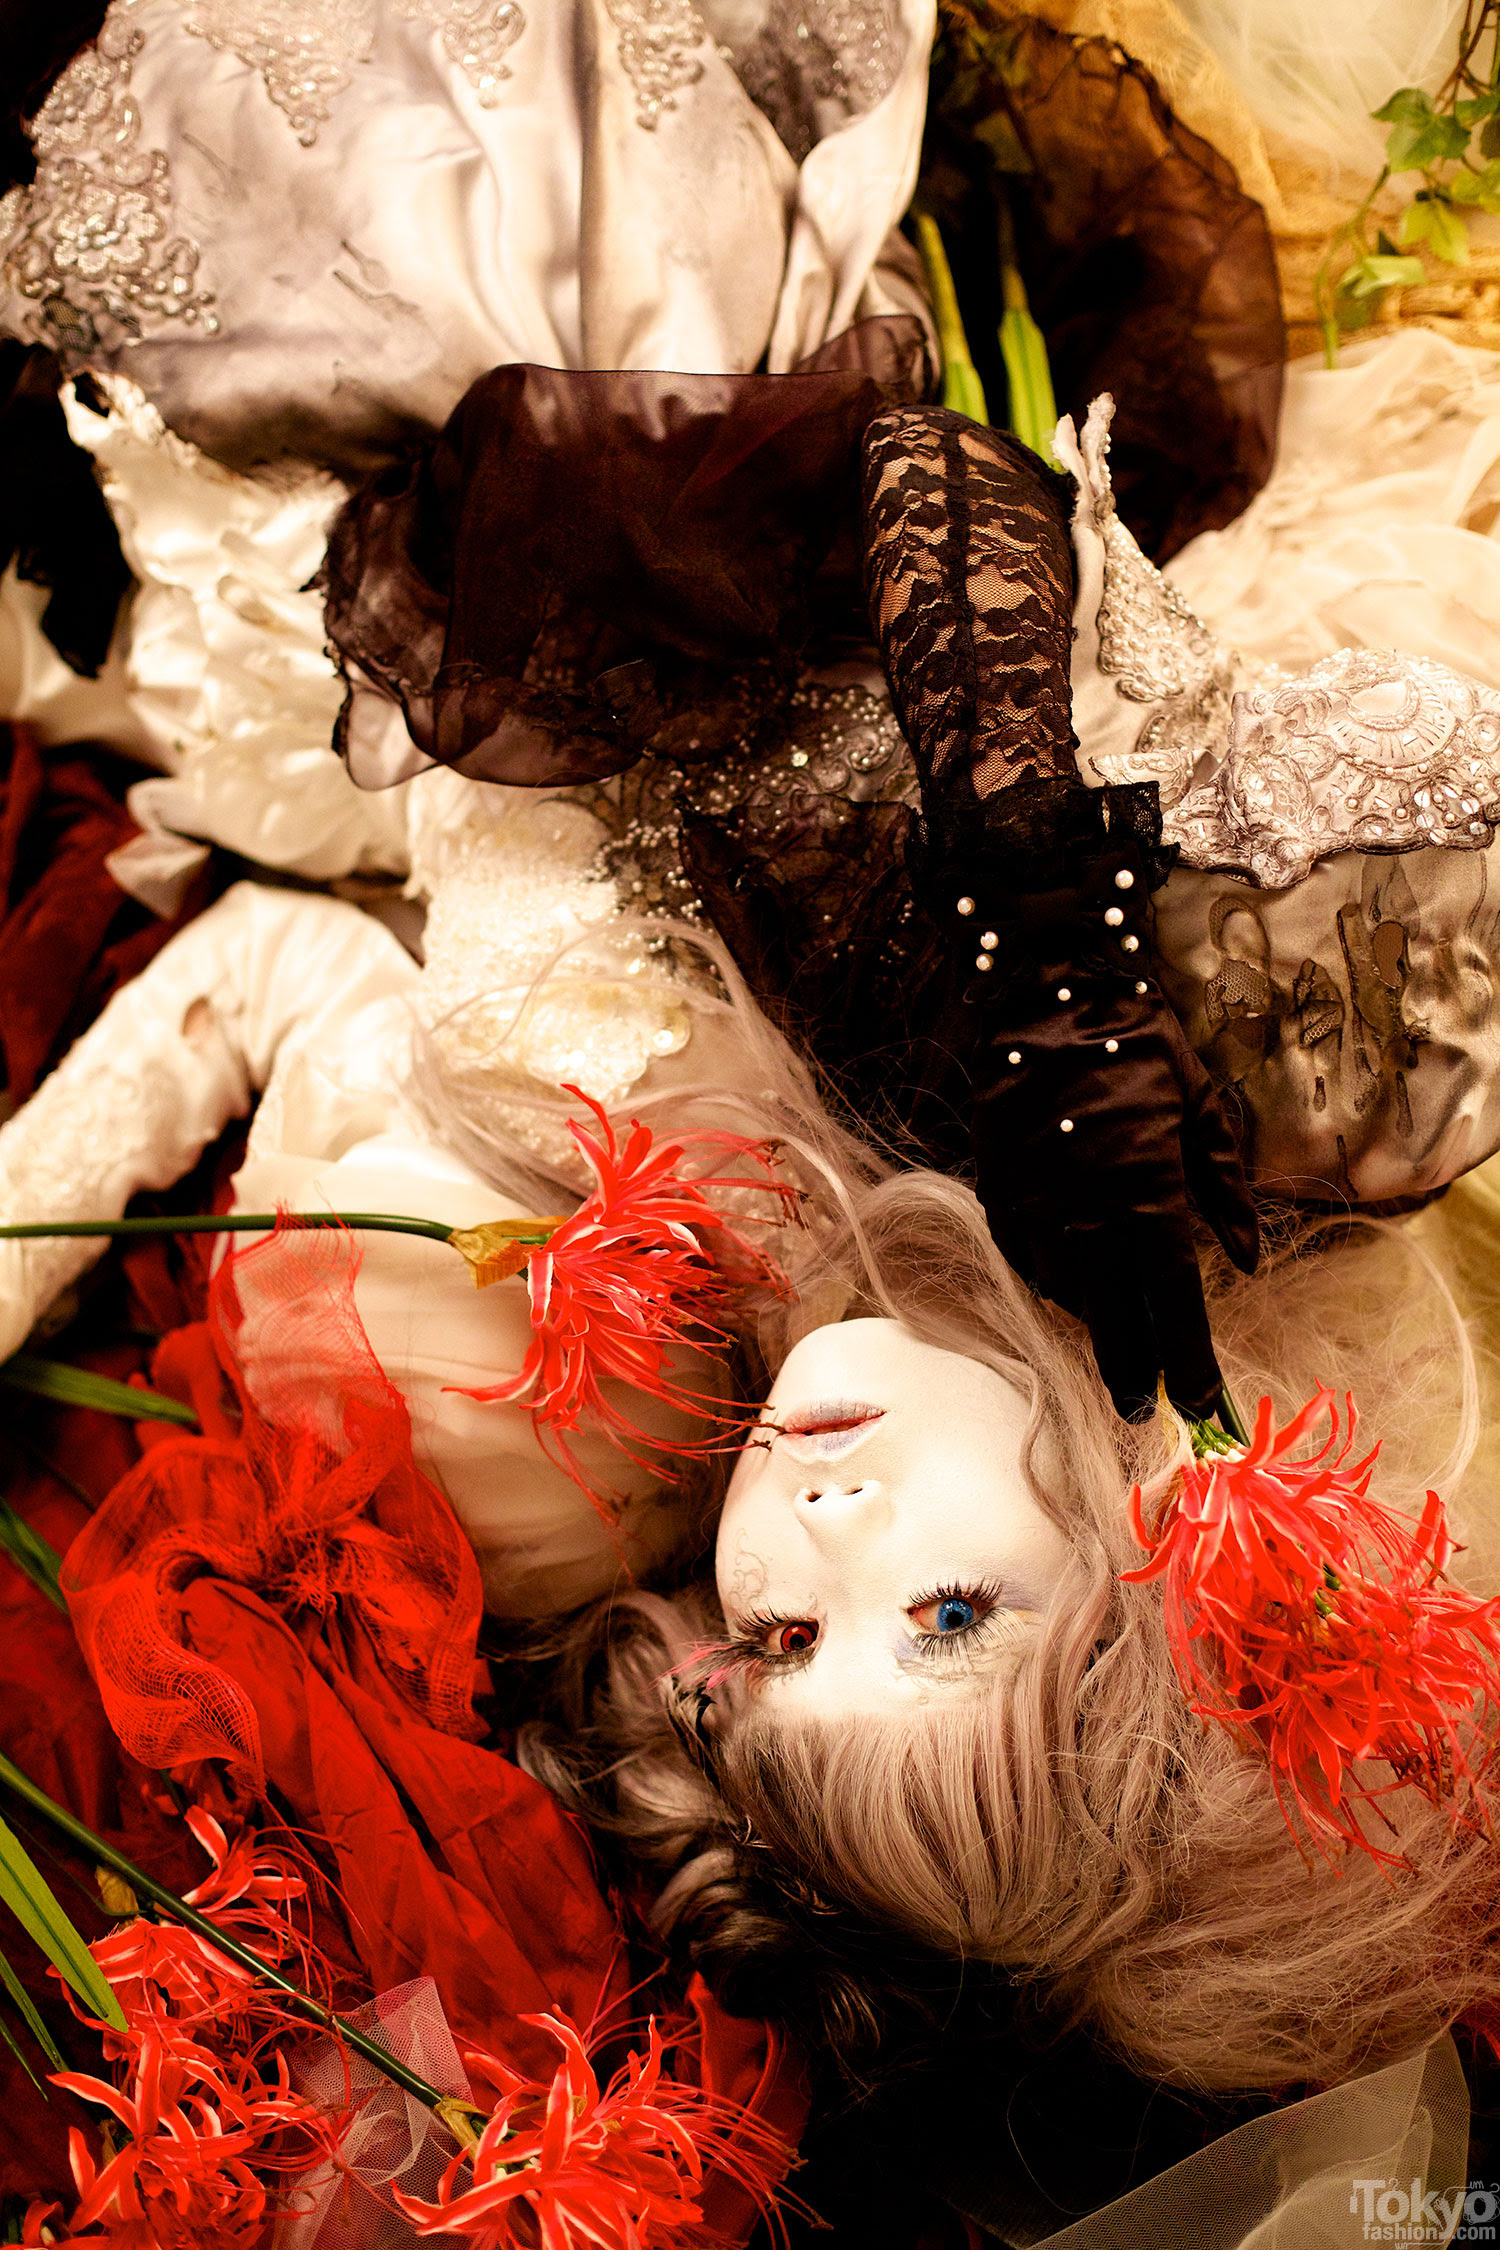 Minori - Her Memories of a Dream (11)